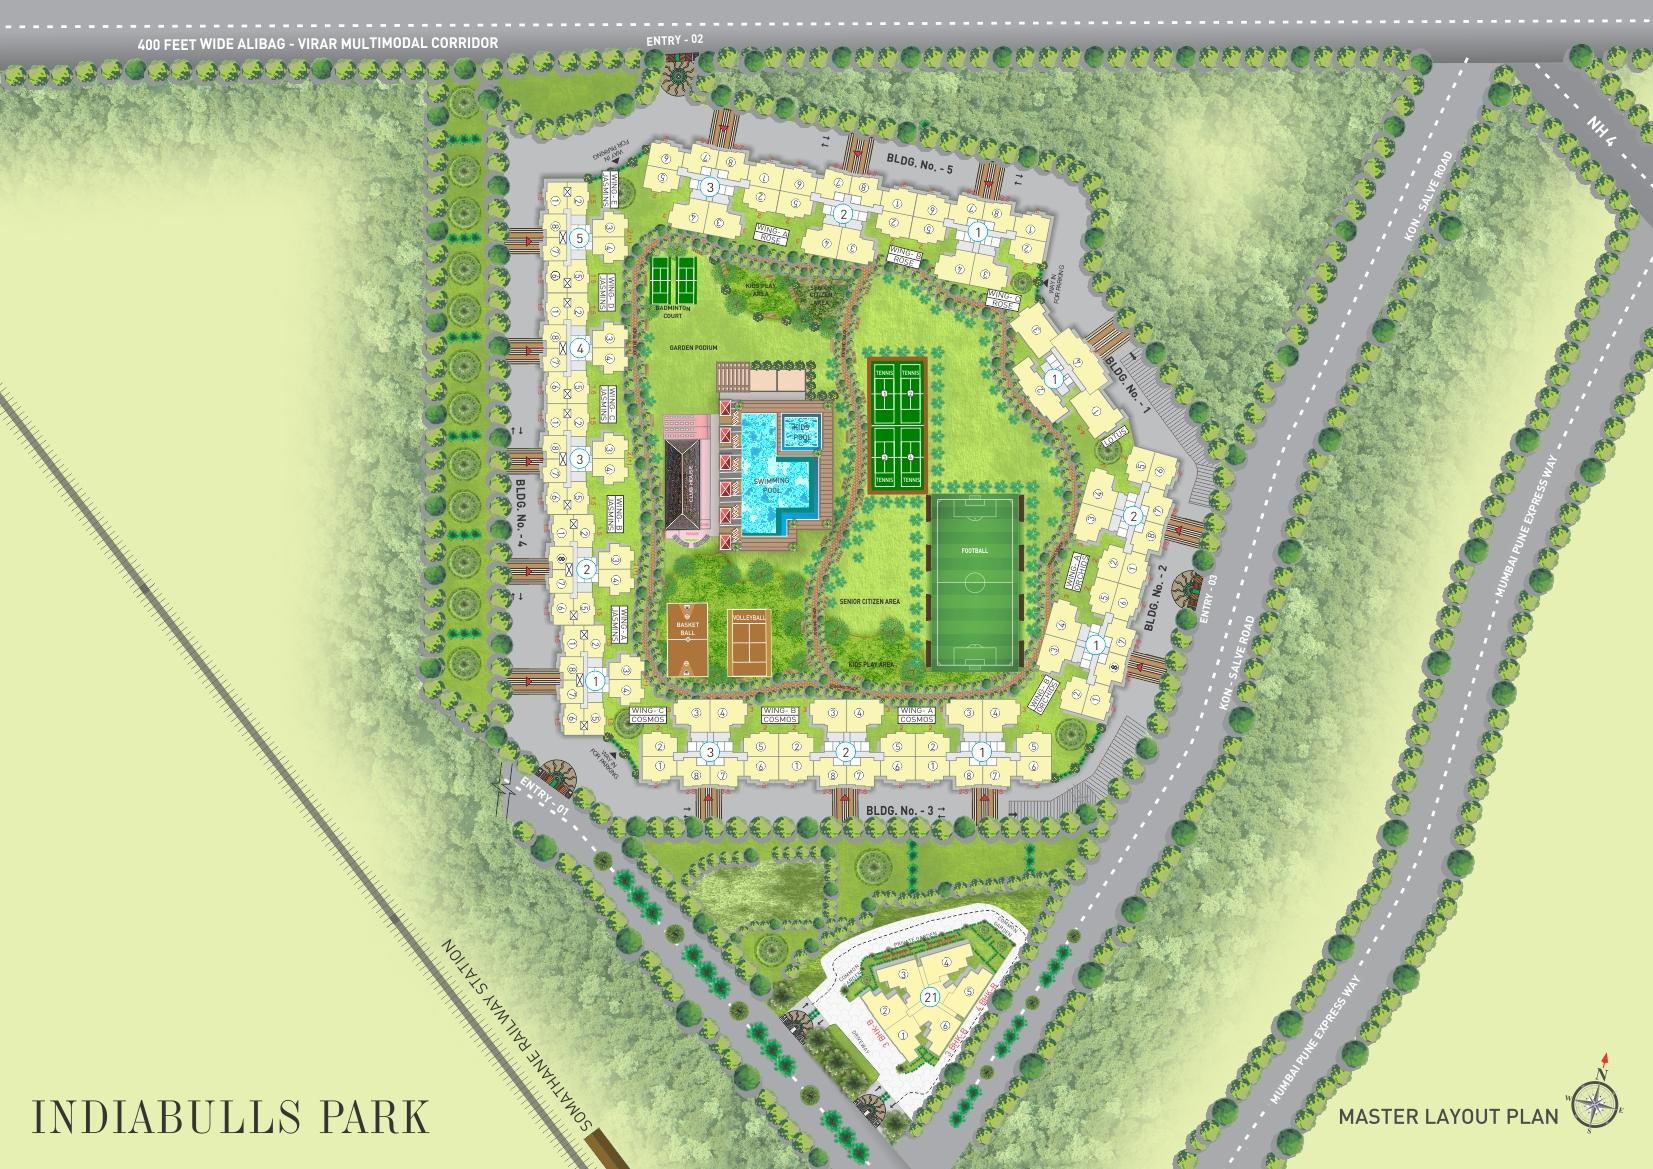 indiabulls park master plan image1